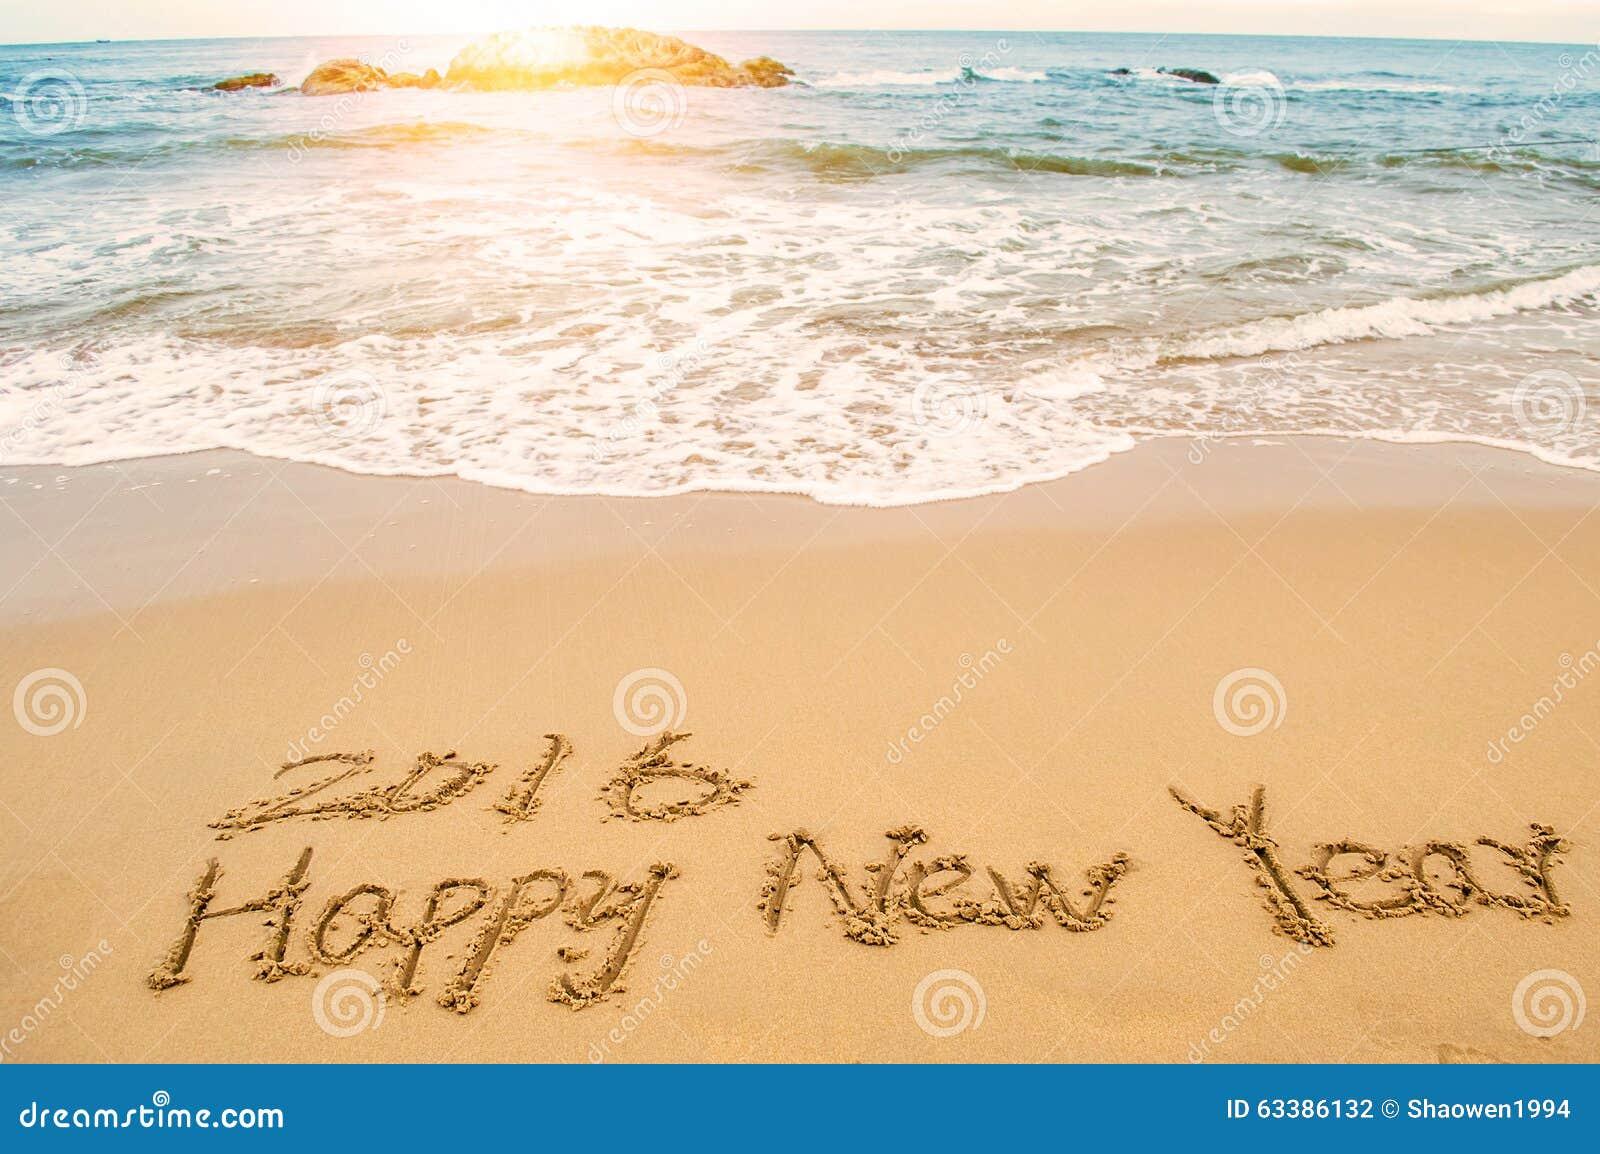 Write happy new year 2016 on beach